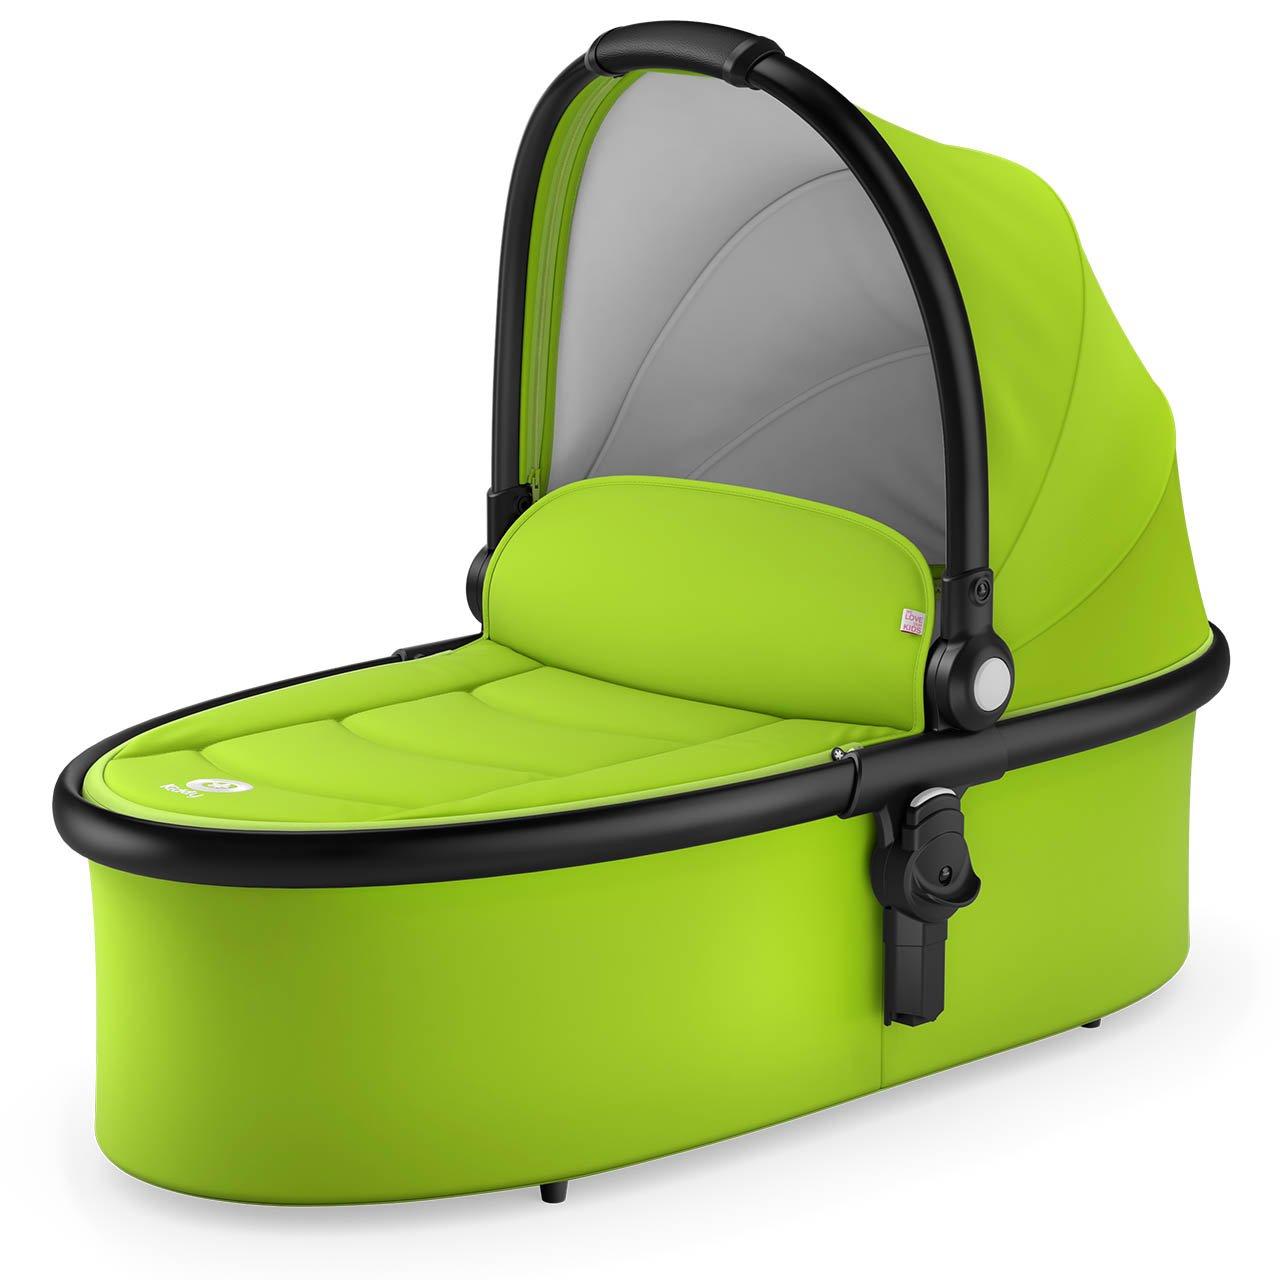 Geburt 6 Monate, circa 9 kg Lime kiddy 4601FCC097 Carrycot Evostar 1 Babywanne, gr/ün